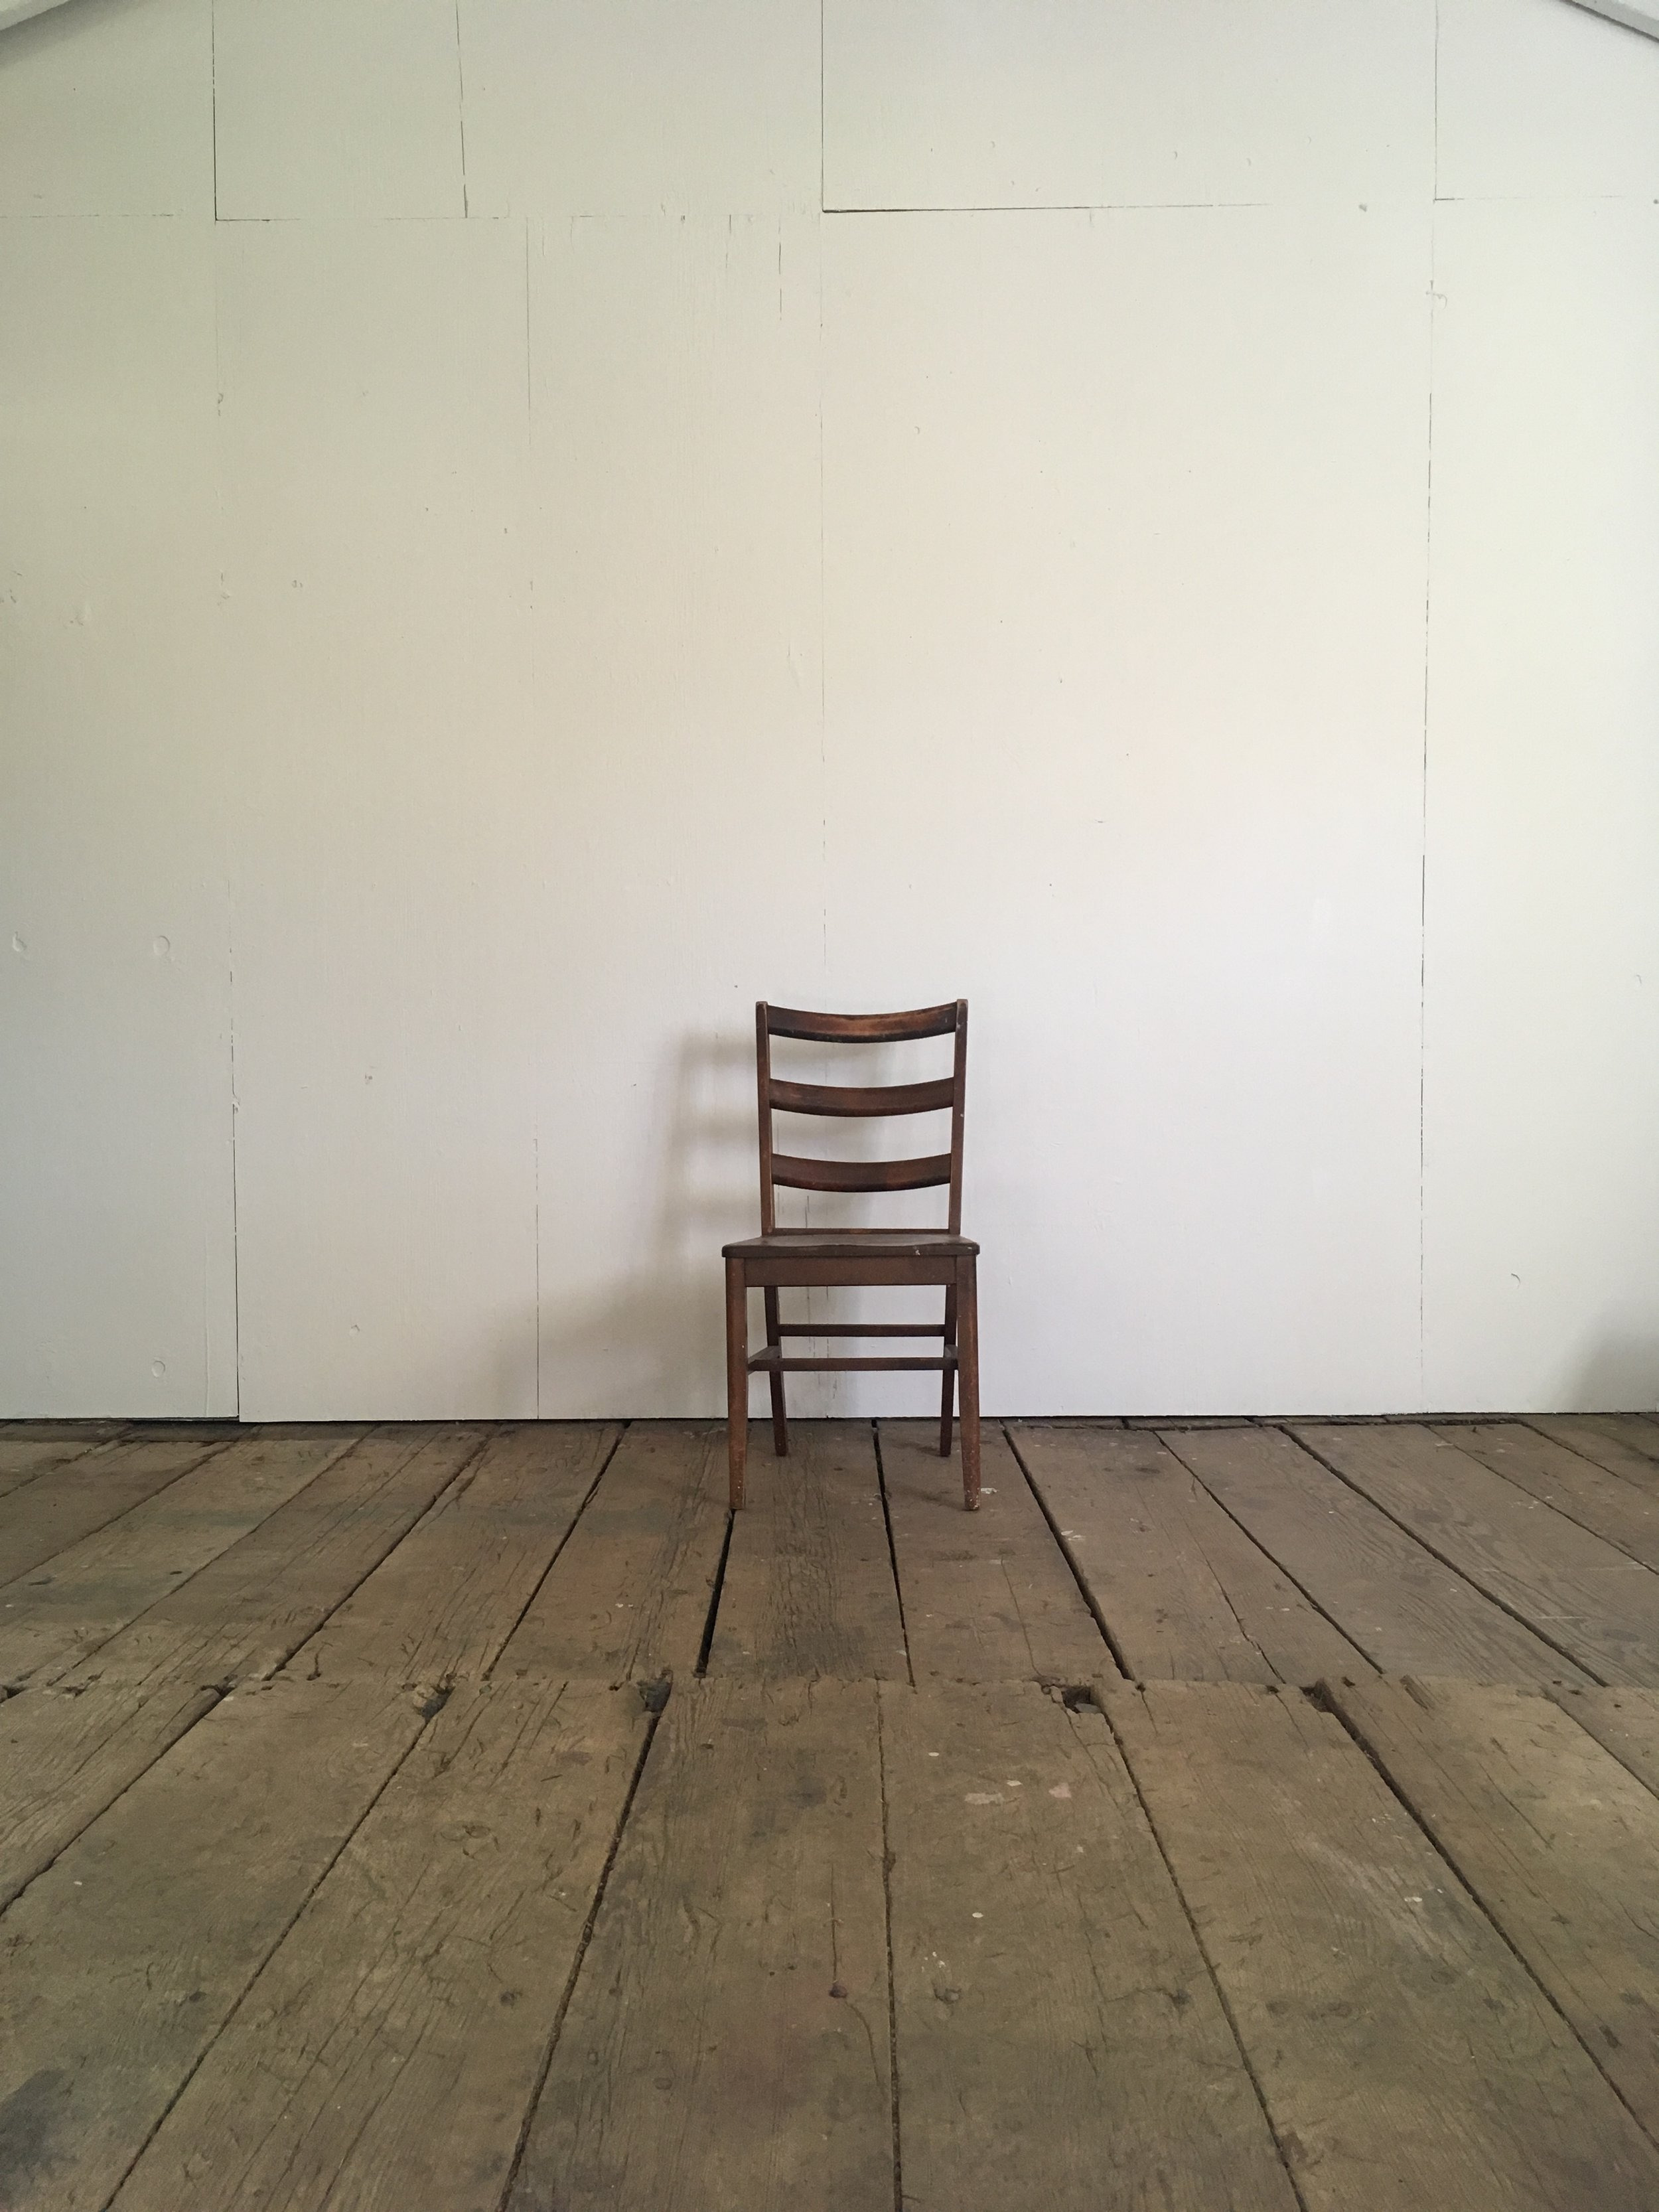 PHOTO chalk hill - studio - jumping chair onlyJPG